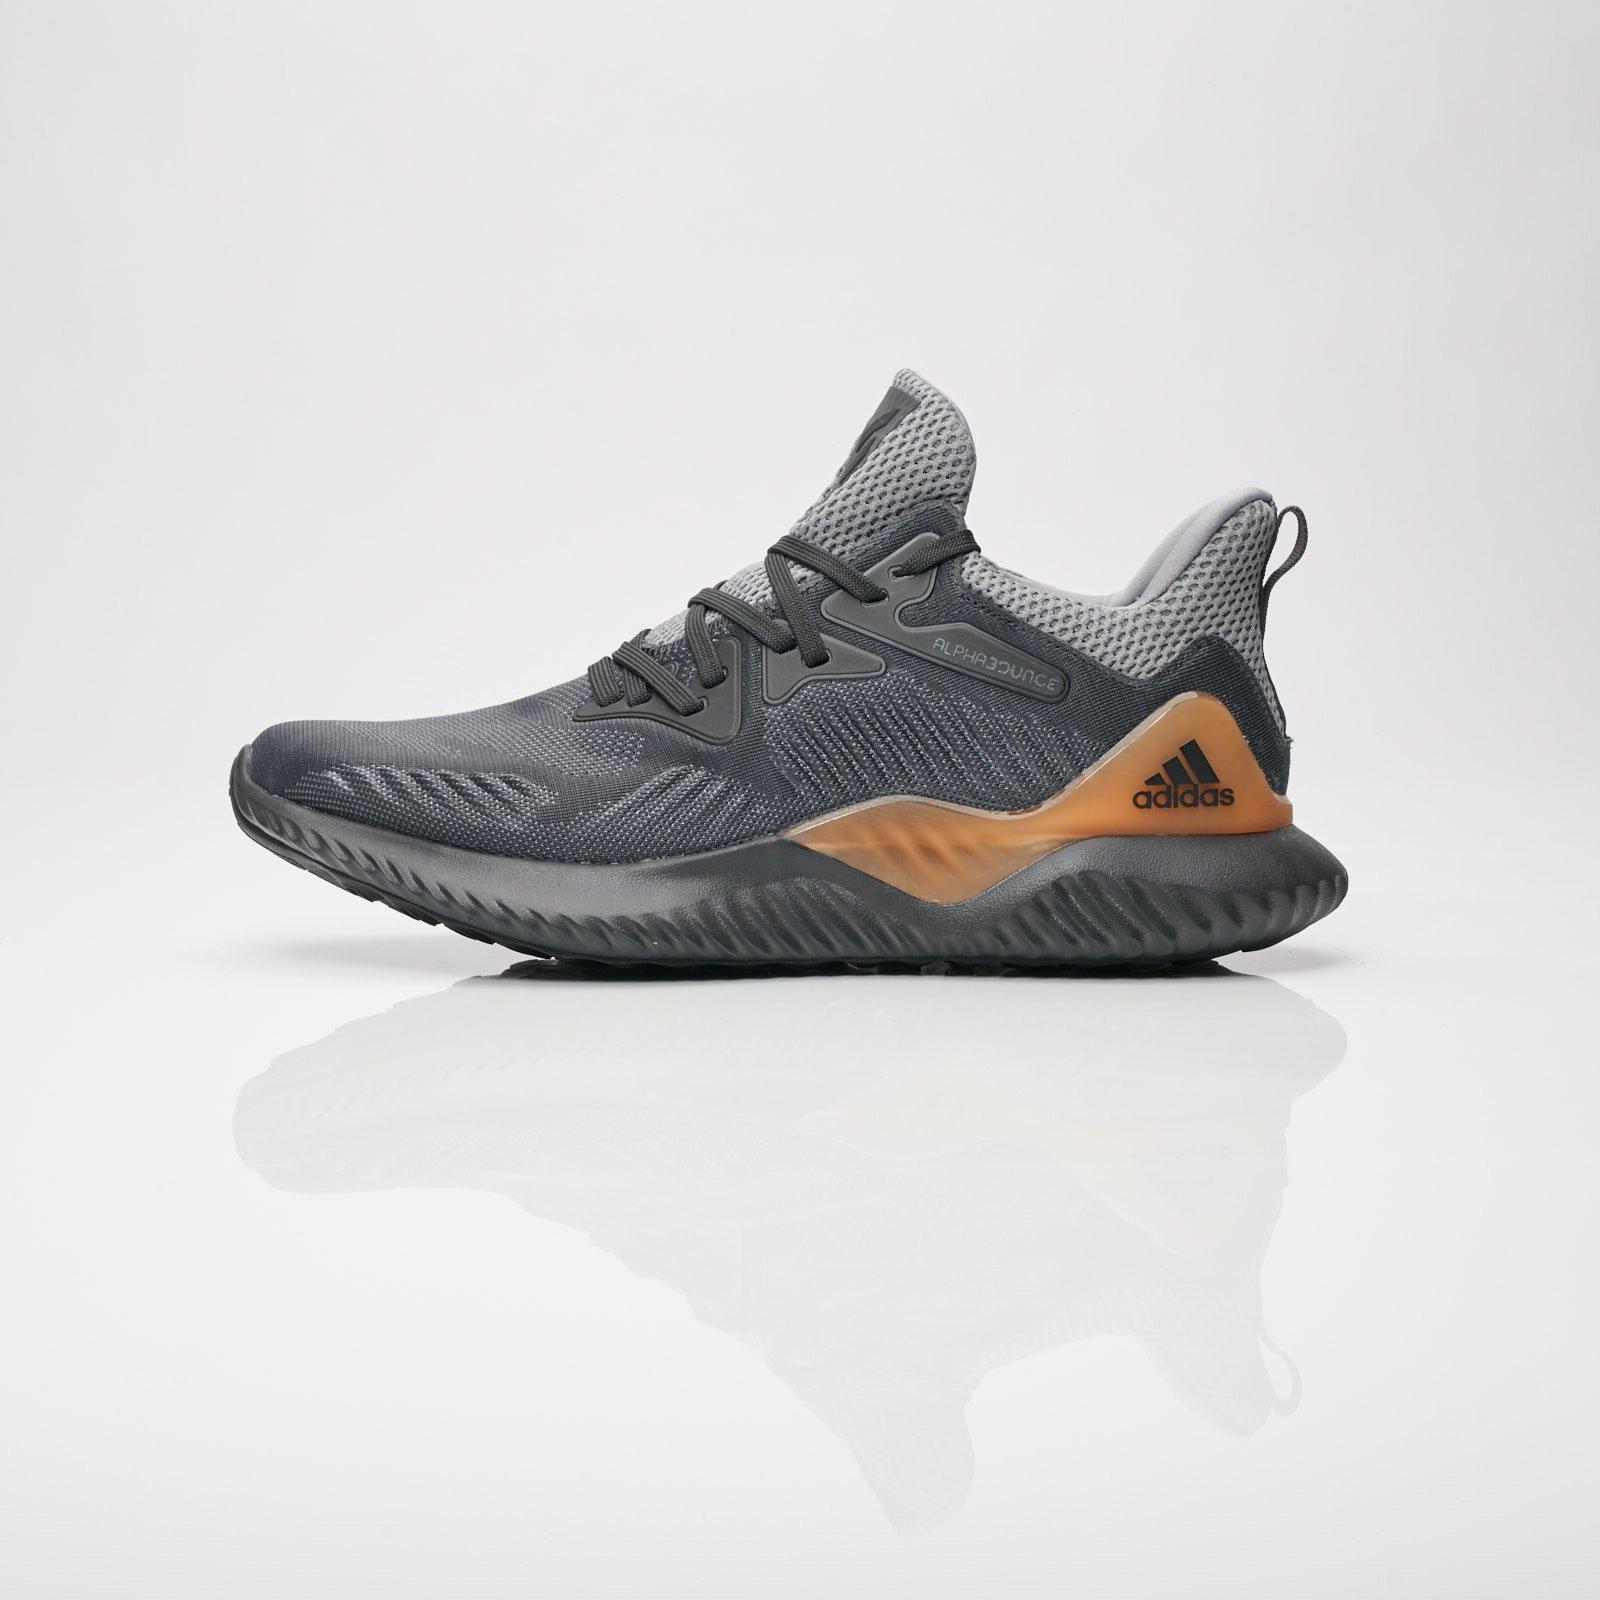 2c868b74c5235 adidas Alphabounce Beyond - Cg4762 - Sneakersnstuff